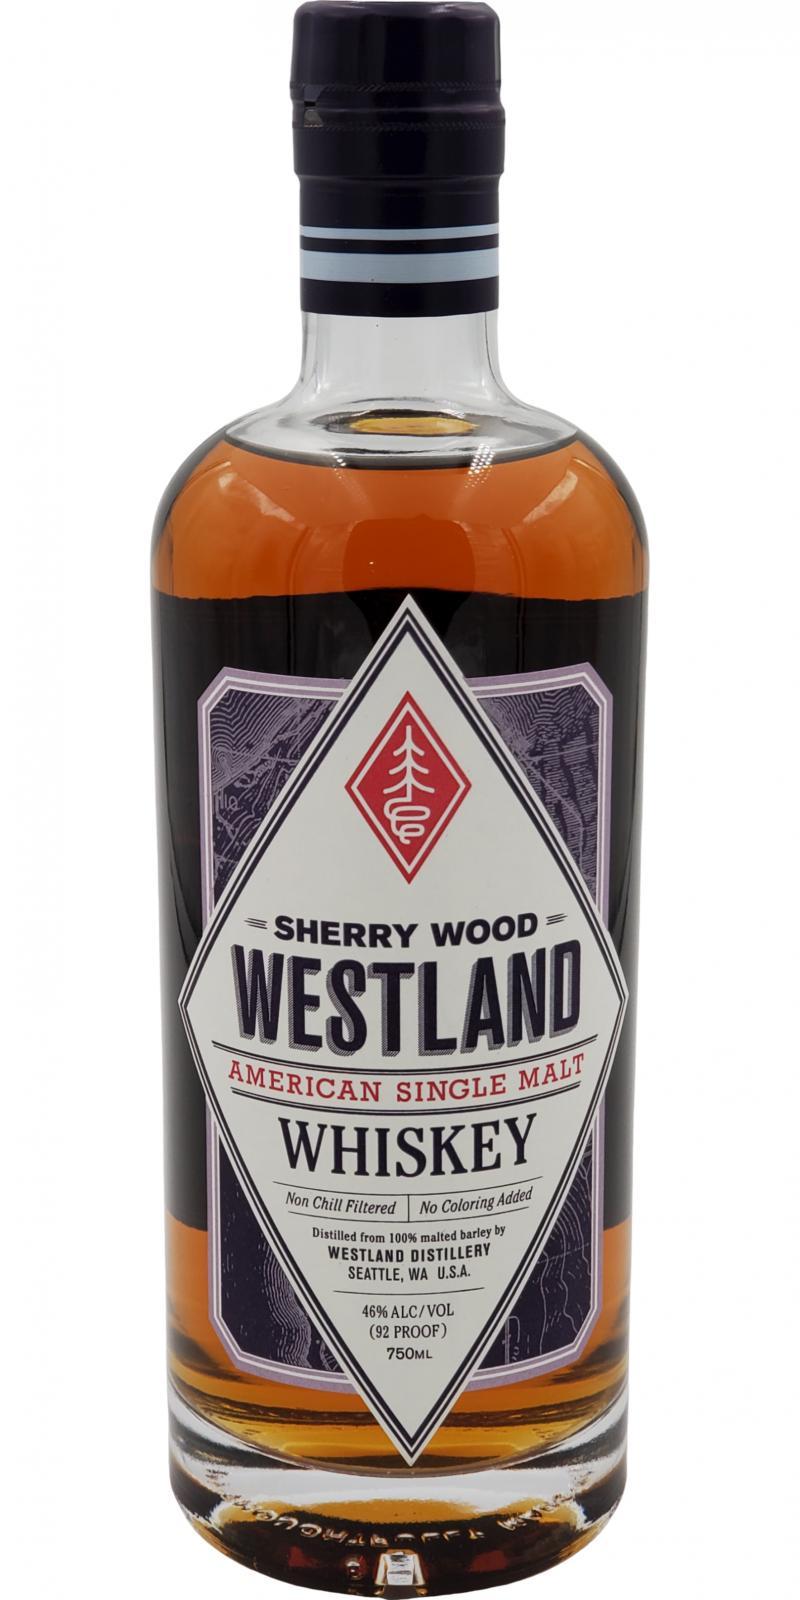 Westland Sherry Wood